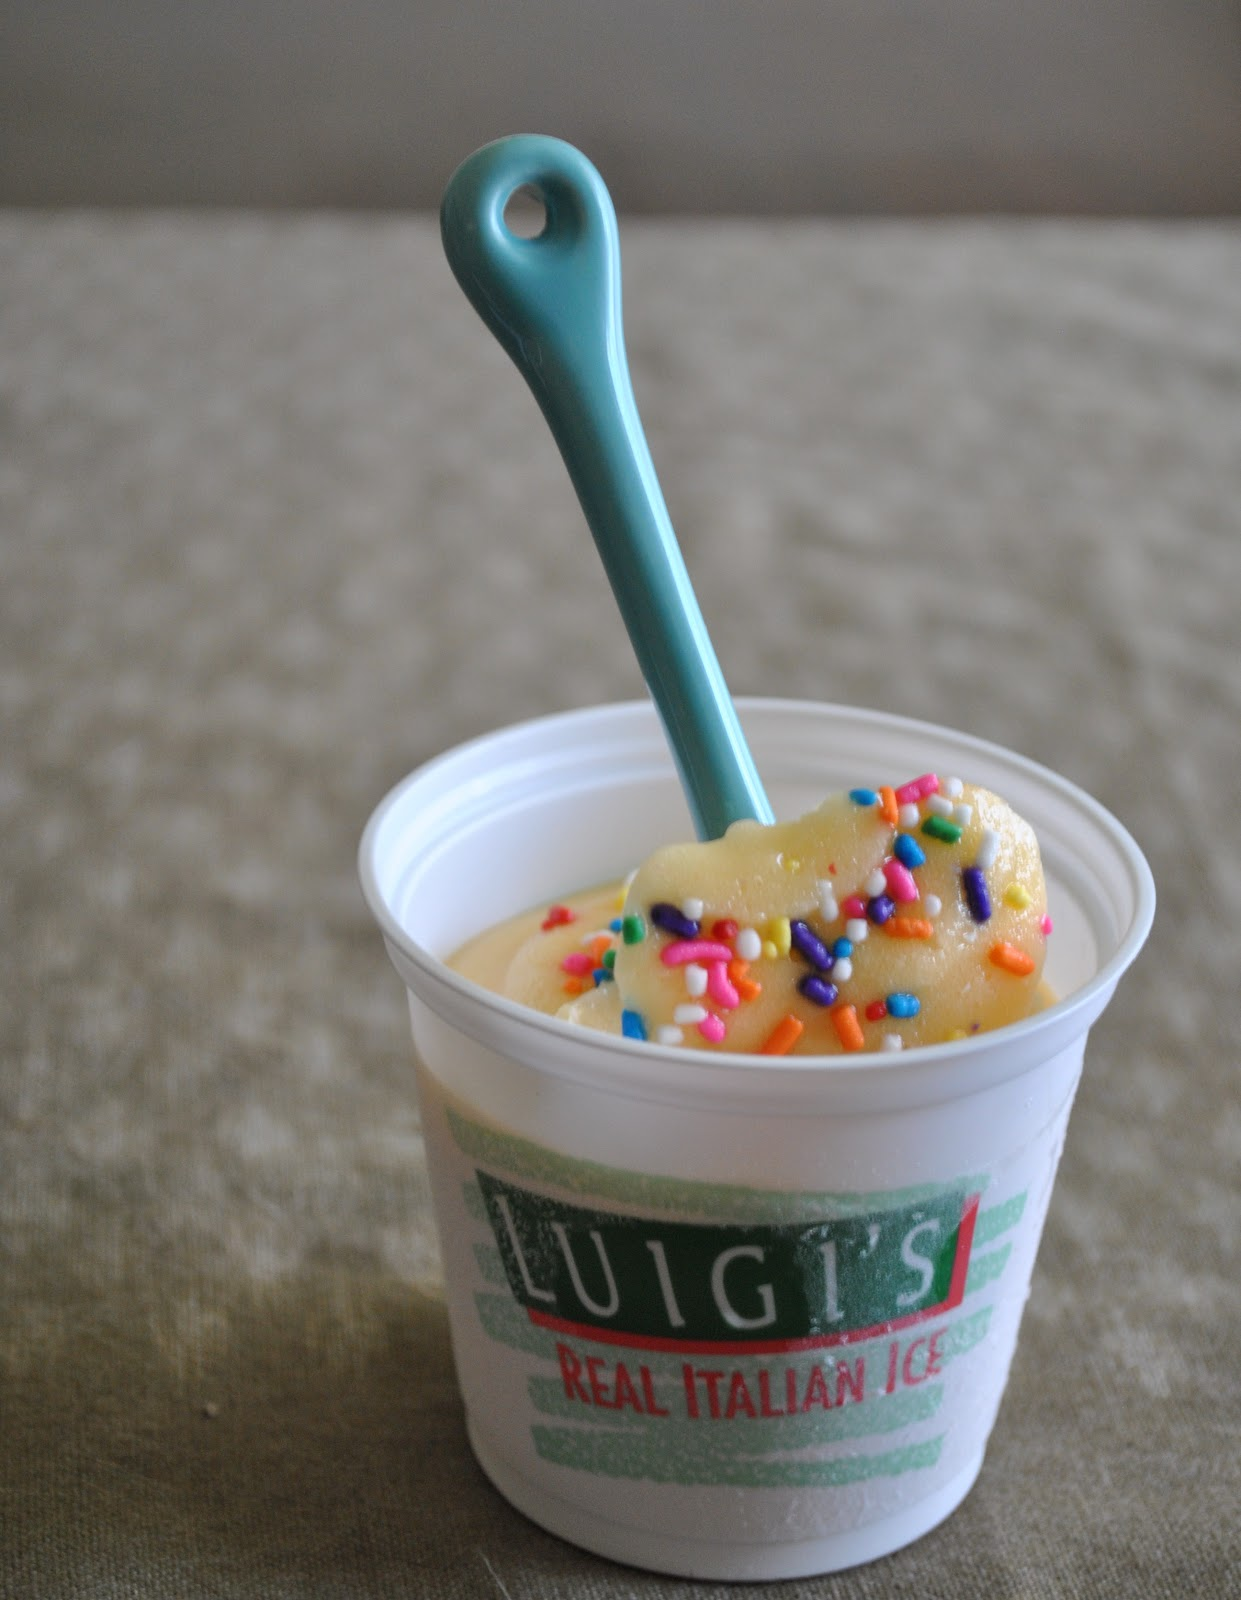 Luigis Limited Edition Birthday Cake Real Italian Ice Foodette